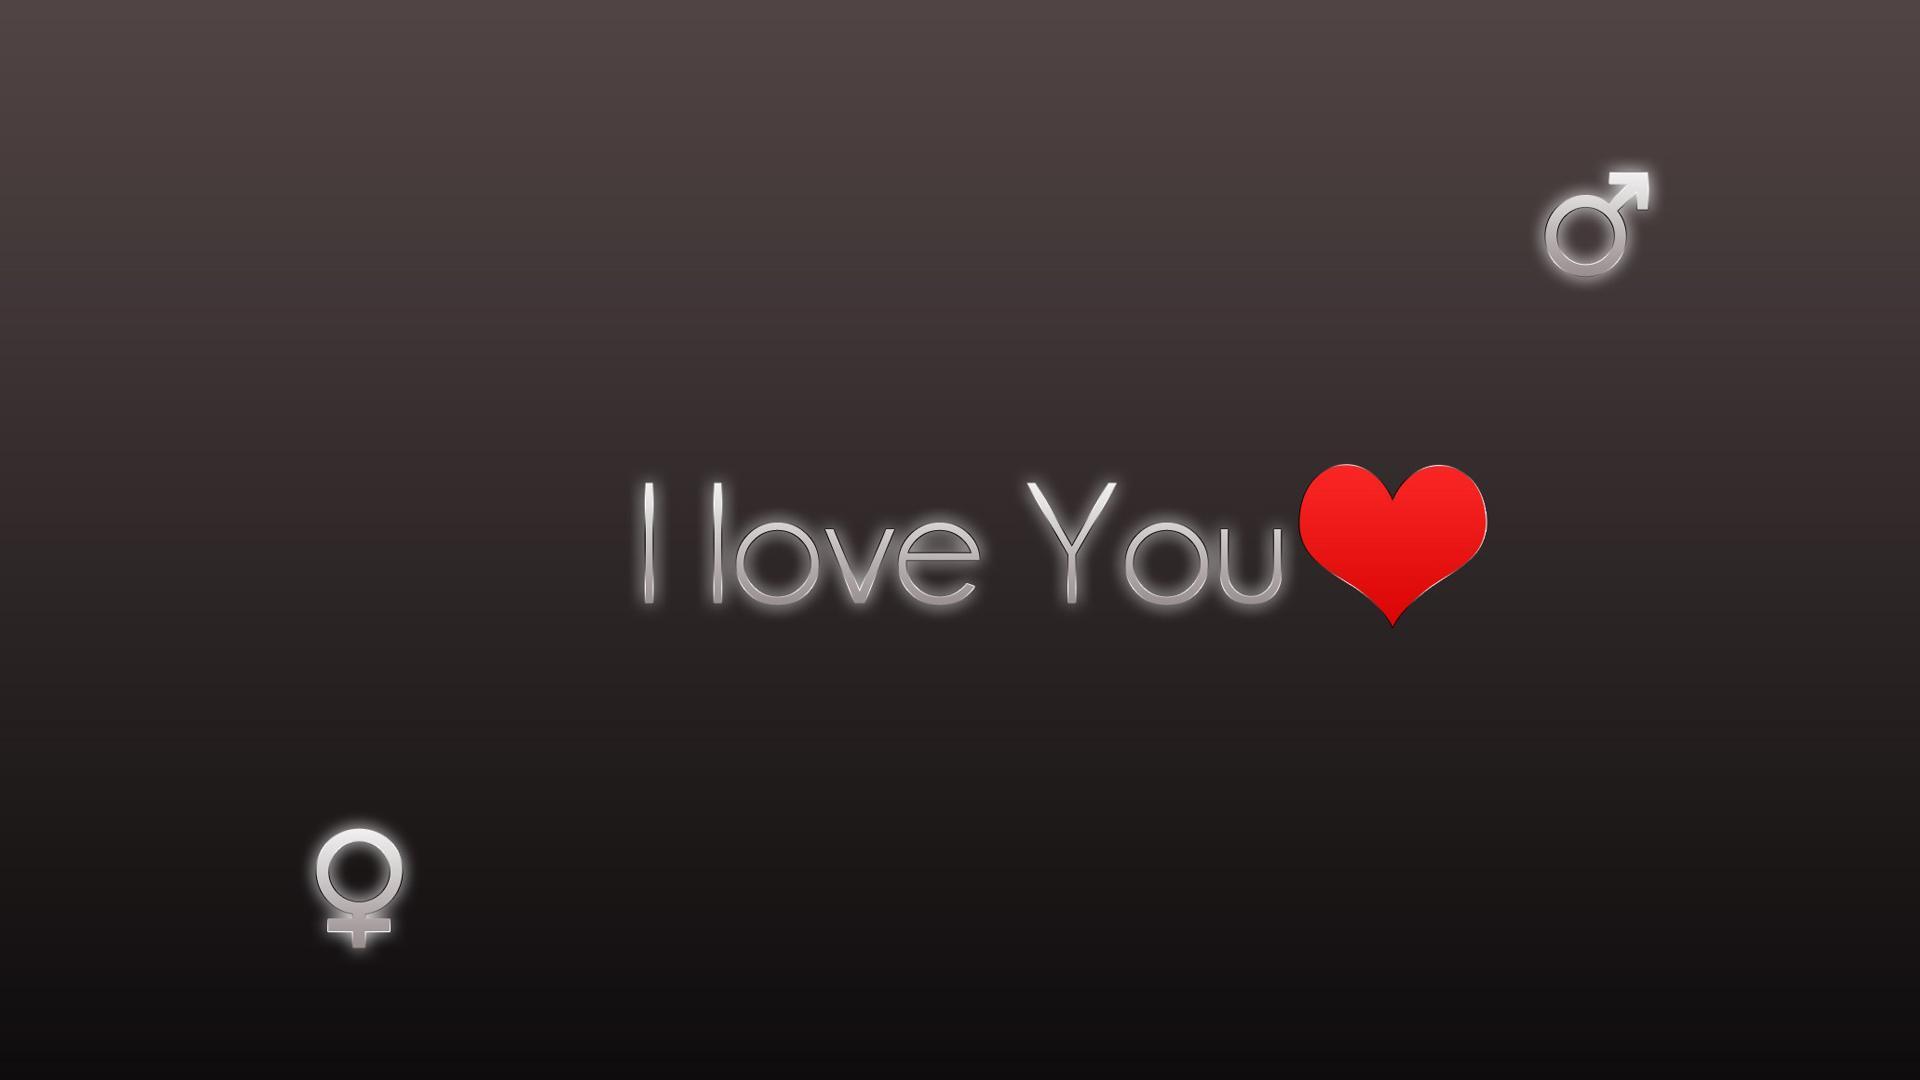 I Love You Heart Hd Backgrounds